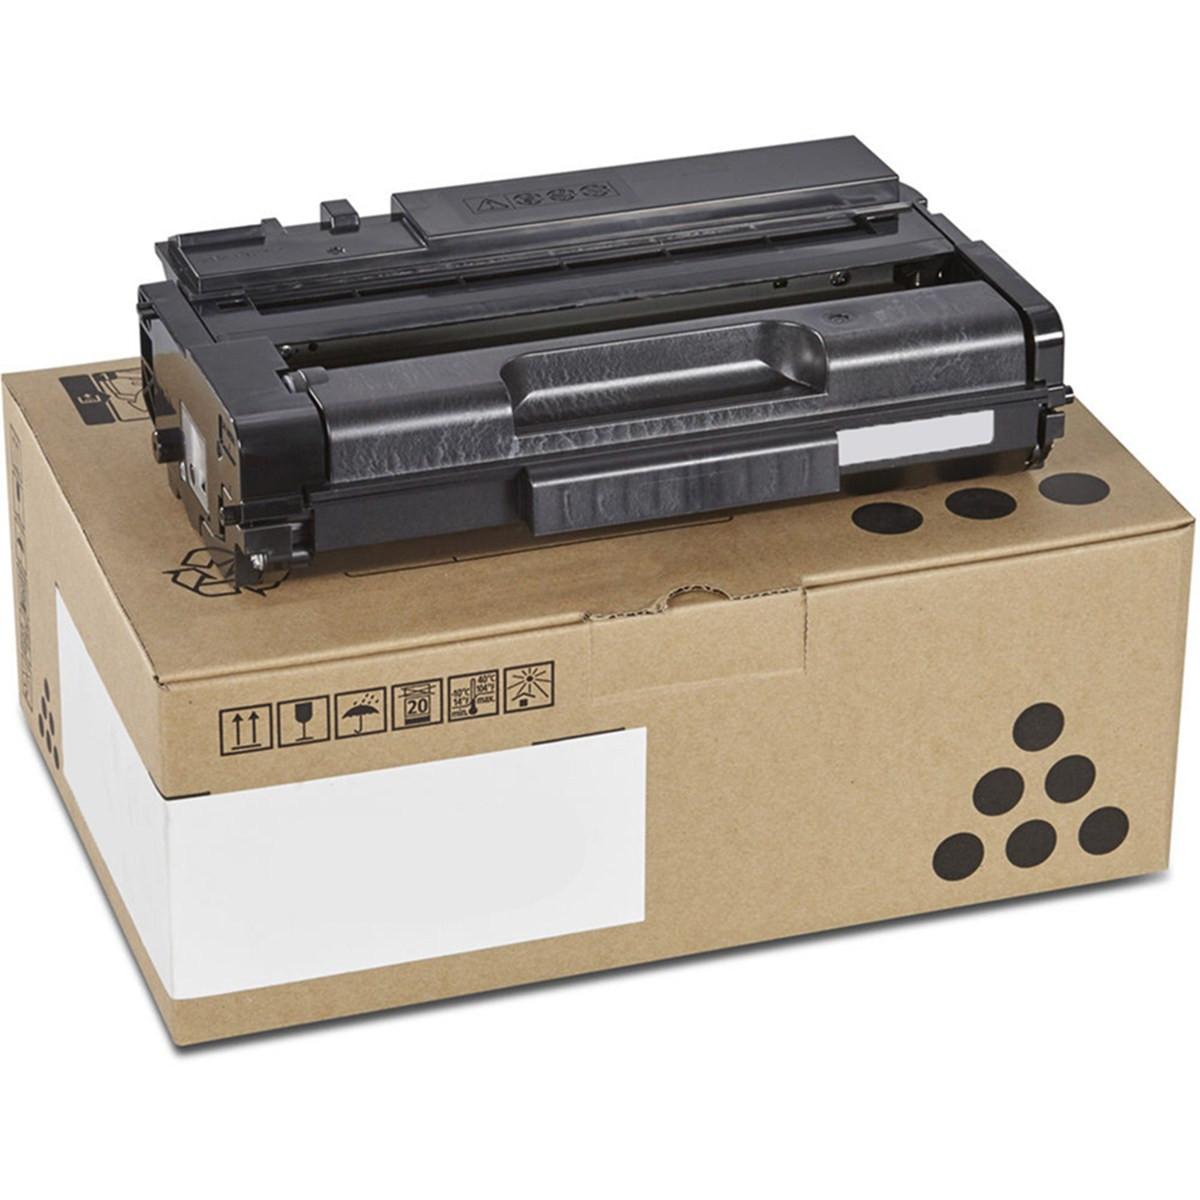 Toner Ricoh SP377 SP377SFNWX SP377DNWX SP 377SFNWX SP 377DNWX 408161R 408161 | Original 6.4k